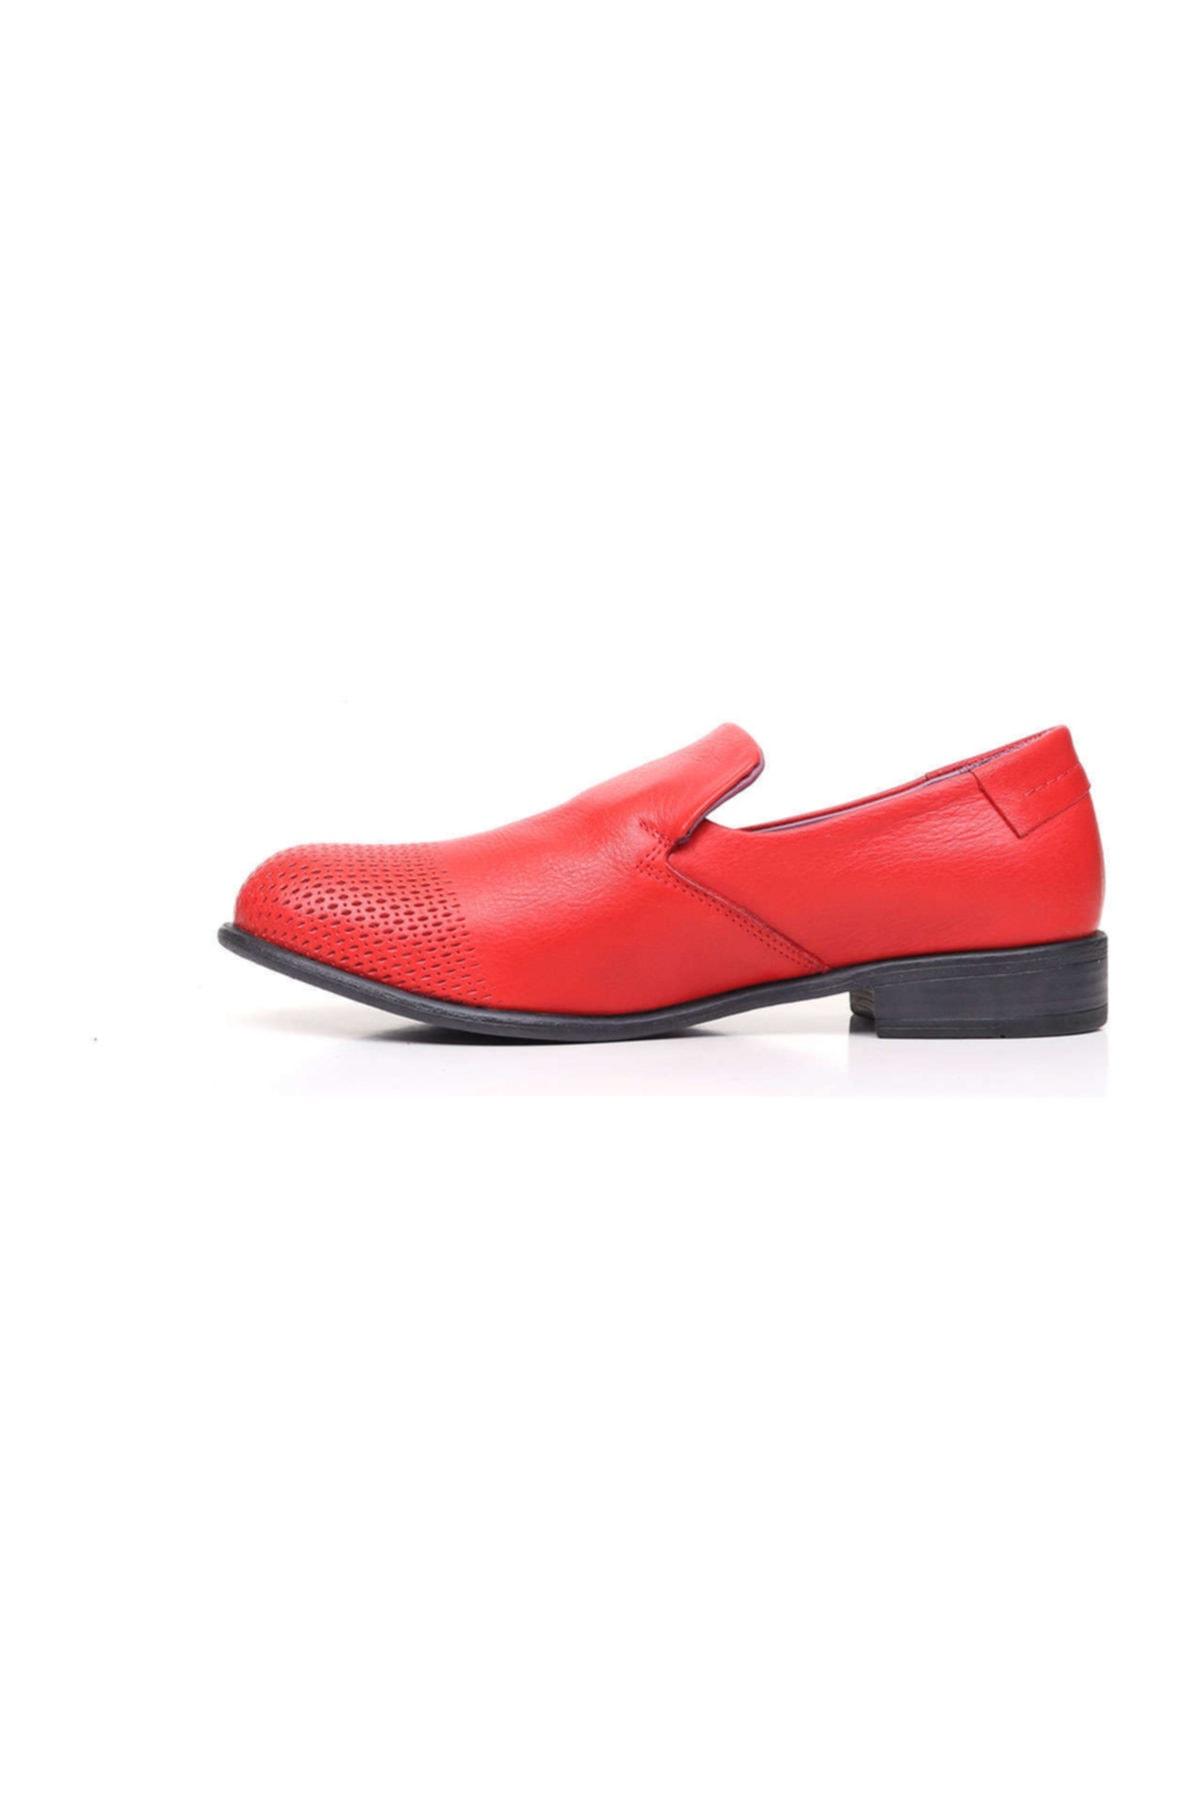 BUENO Shoes  Kadın Ayakkabı 9p1700 2